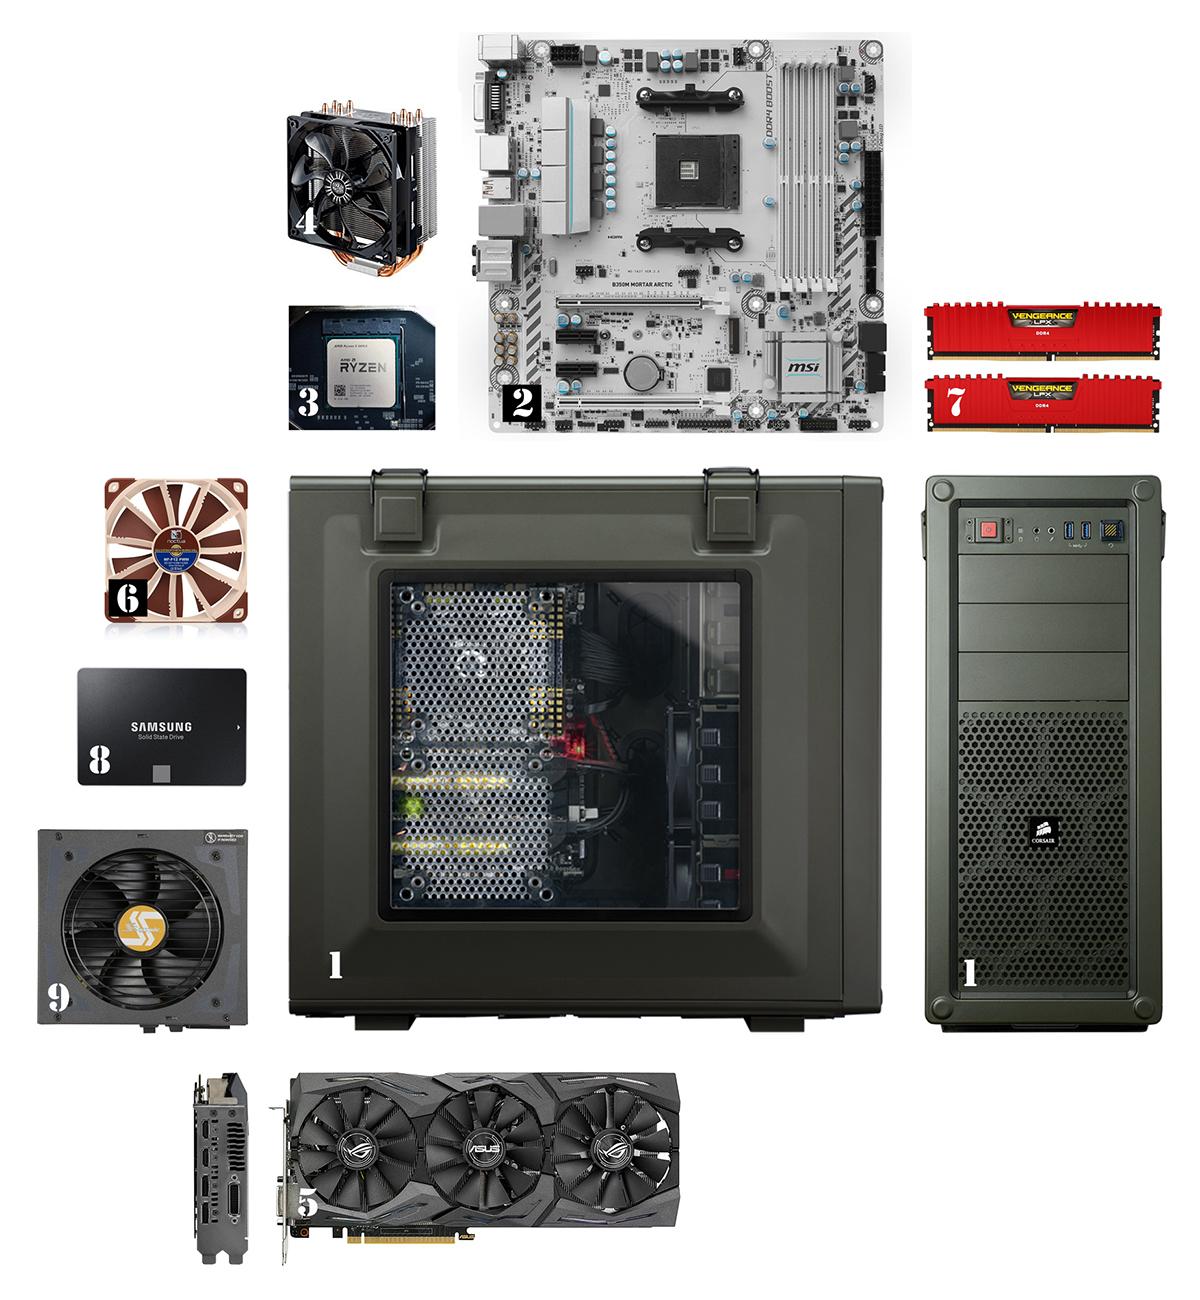 Build your own computer - Landon Williams